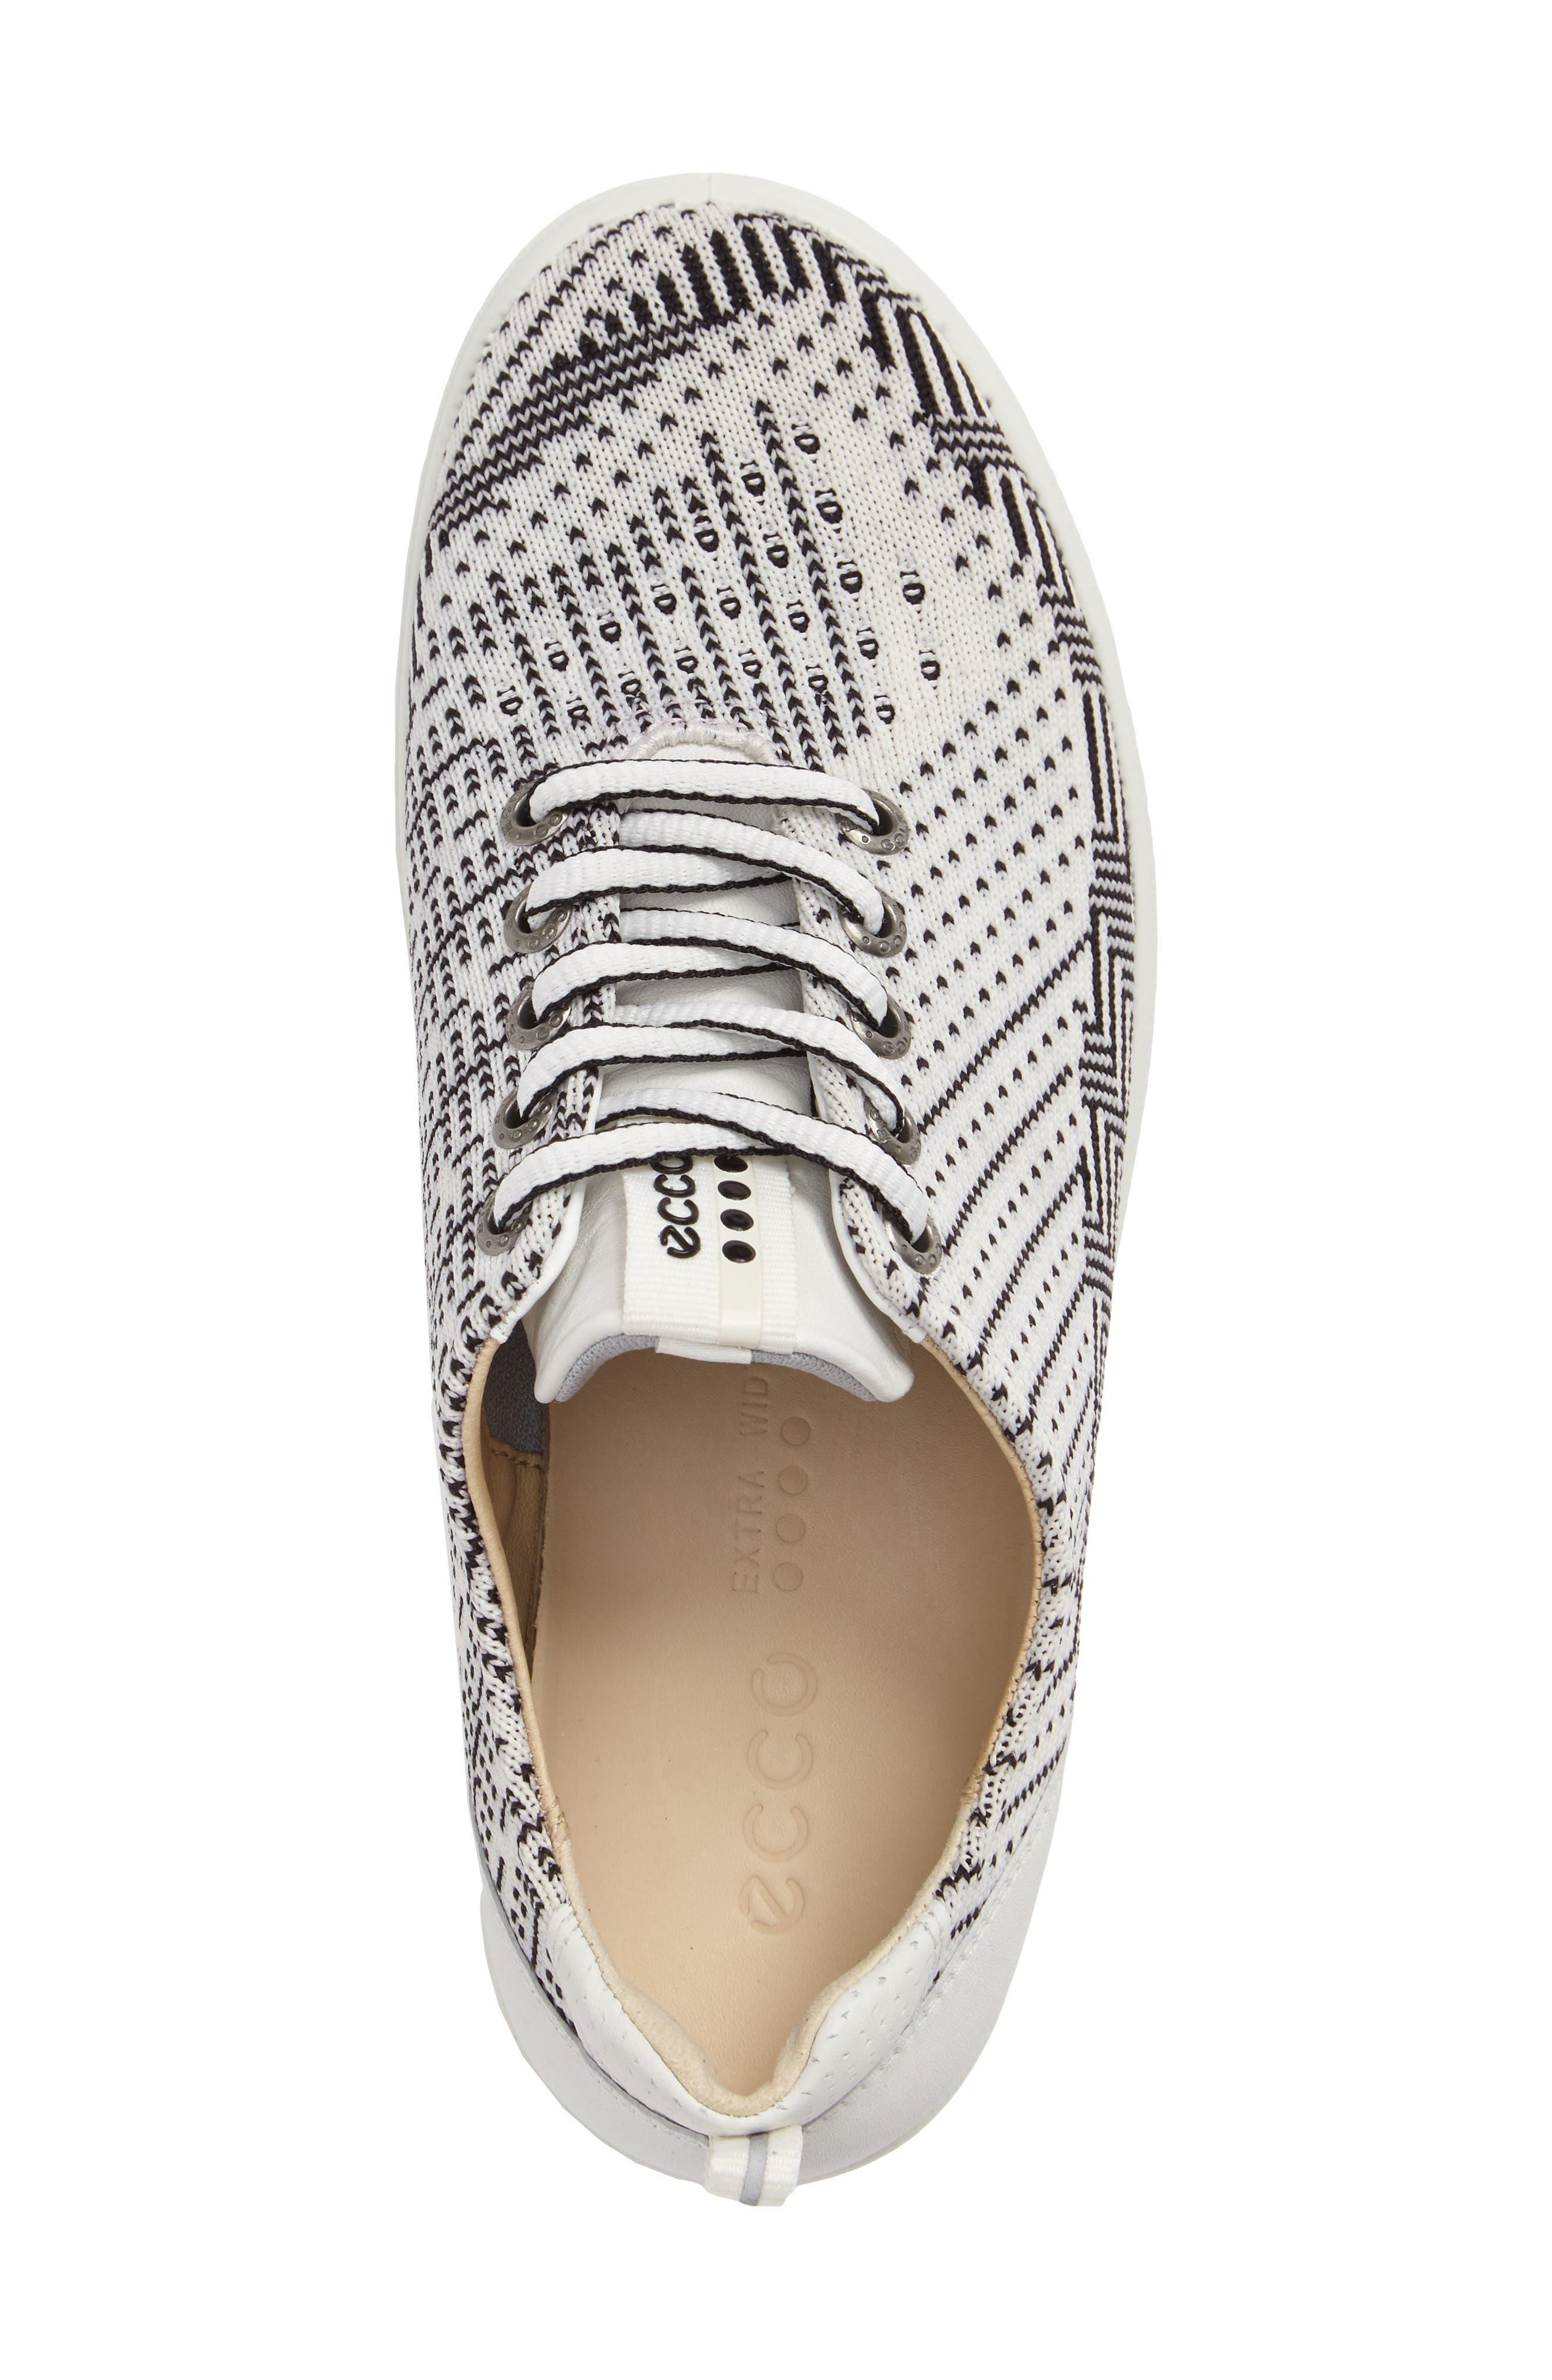 Casual Hybrid Knit Golf Sneaker,                             Alternate thumbnail 3, color,                             White/ Black/ White Leather